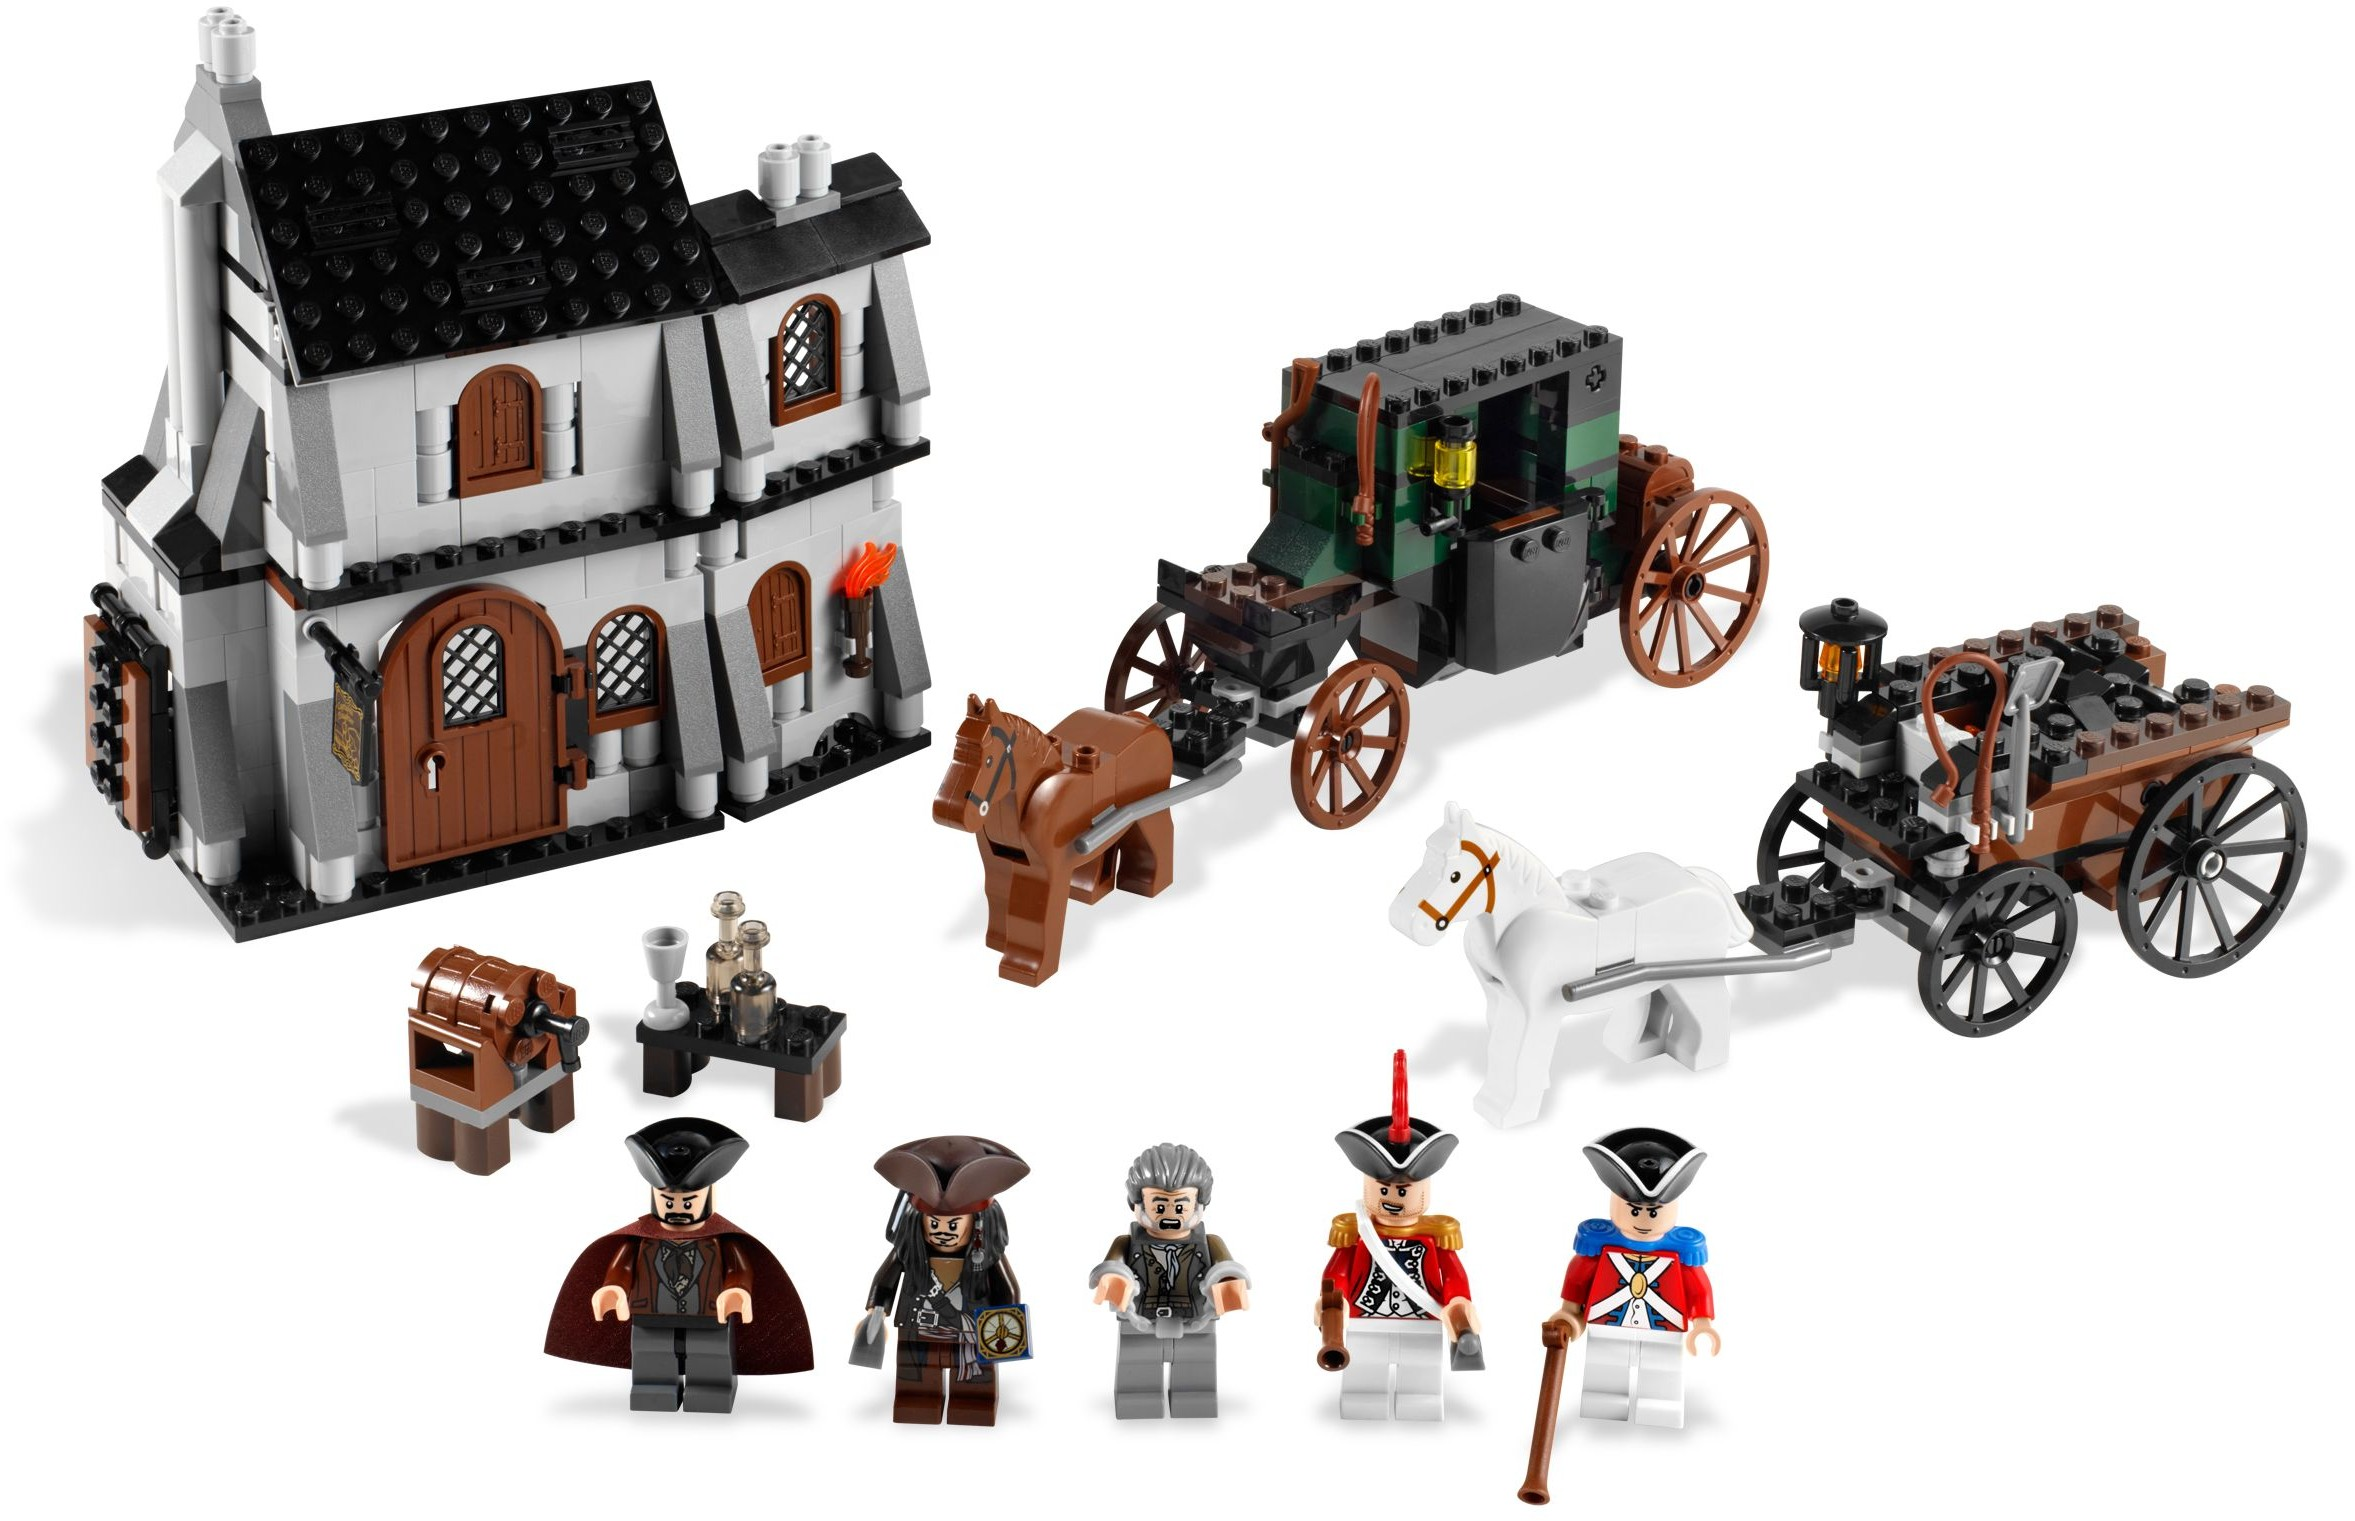 Pirates Of The Caribbean Brickset Lego Set Guide And Database